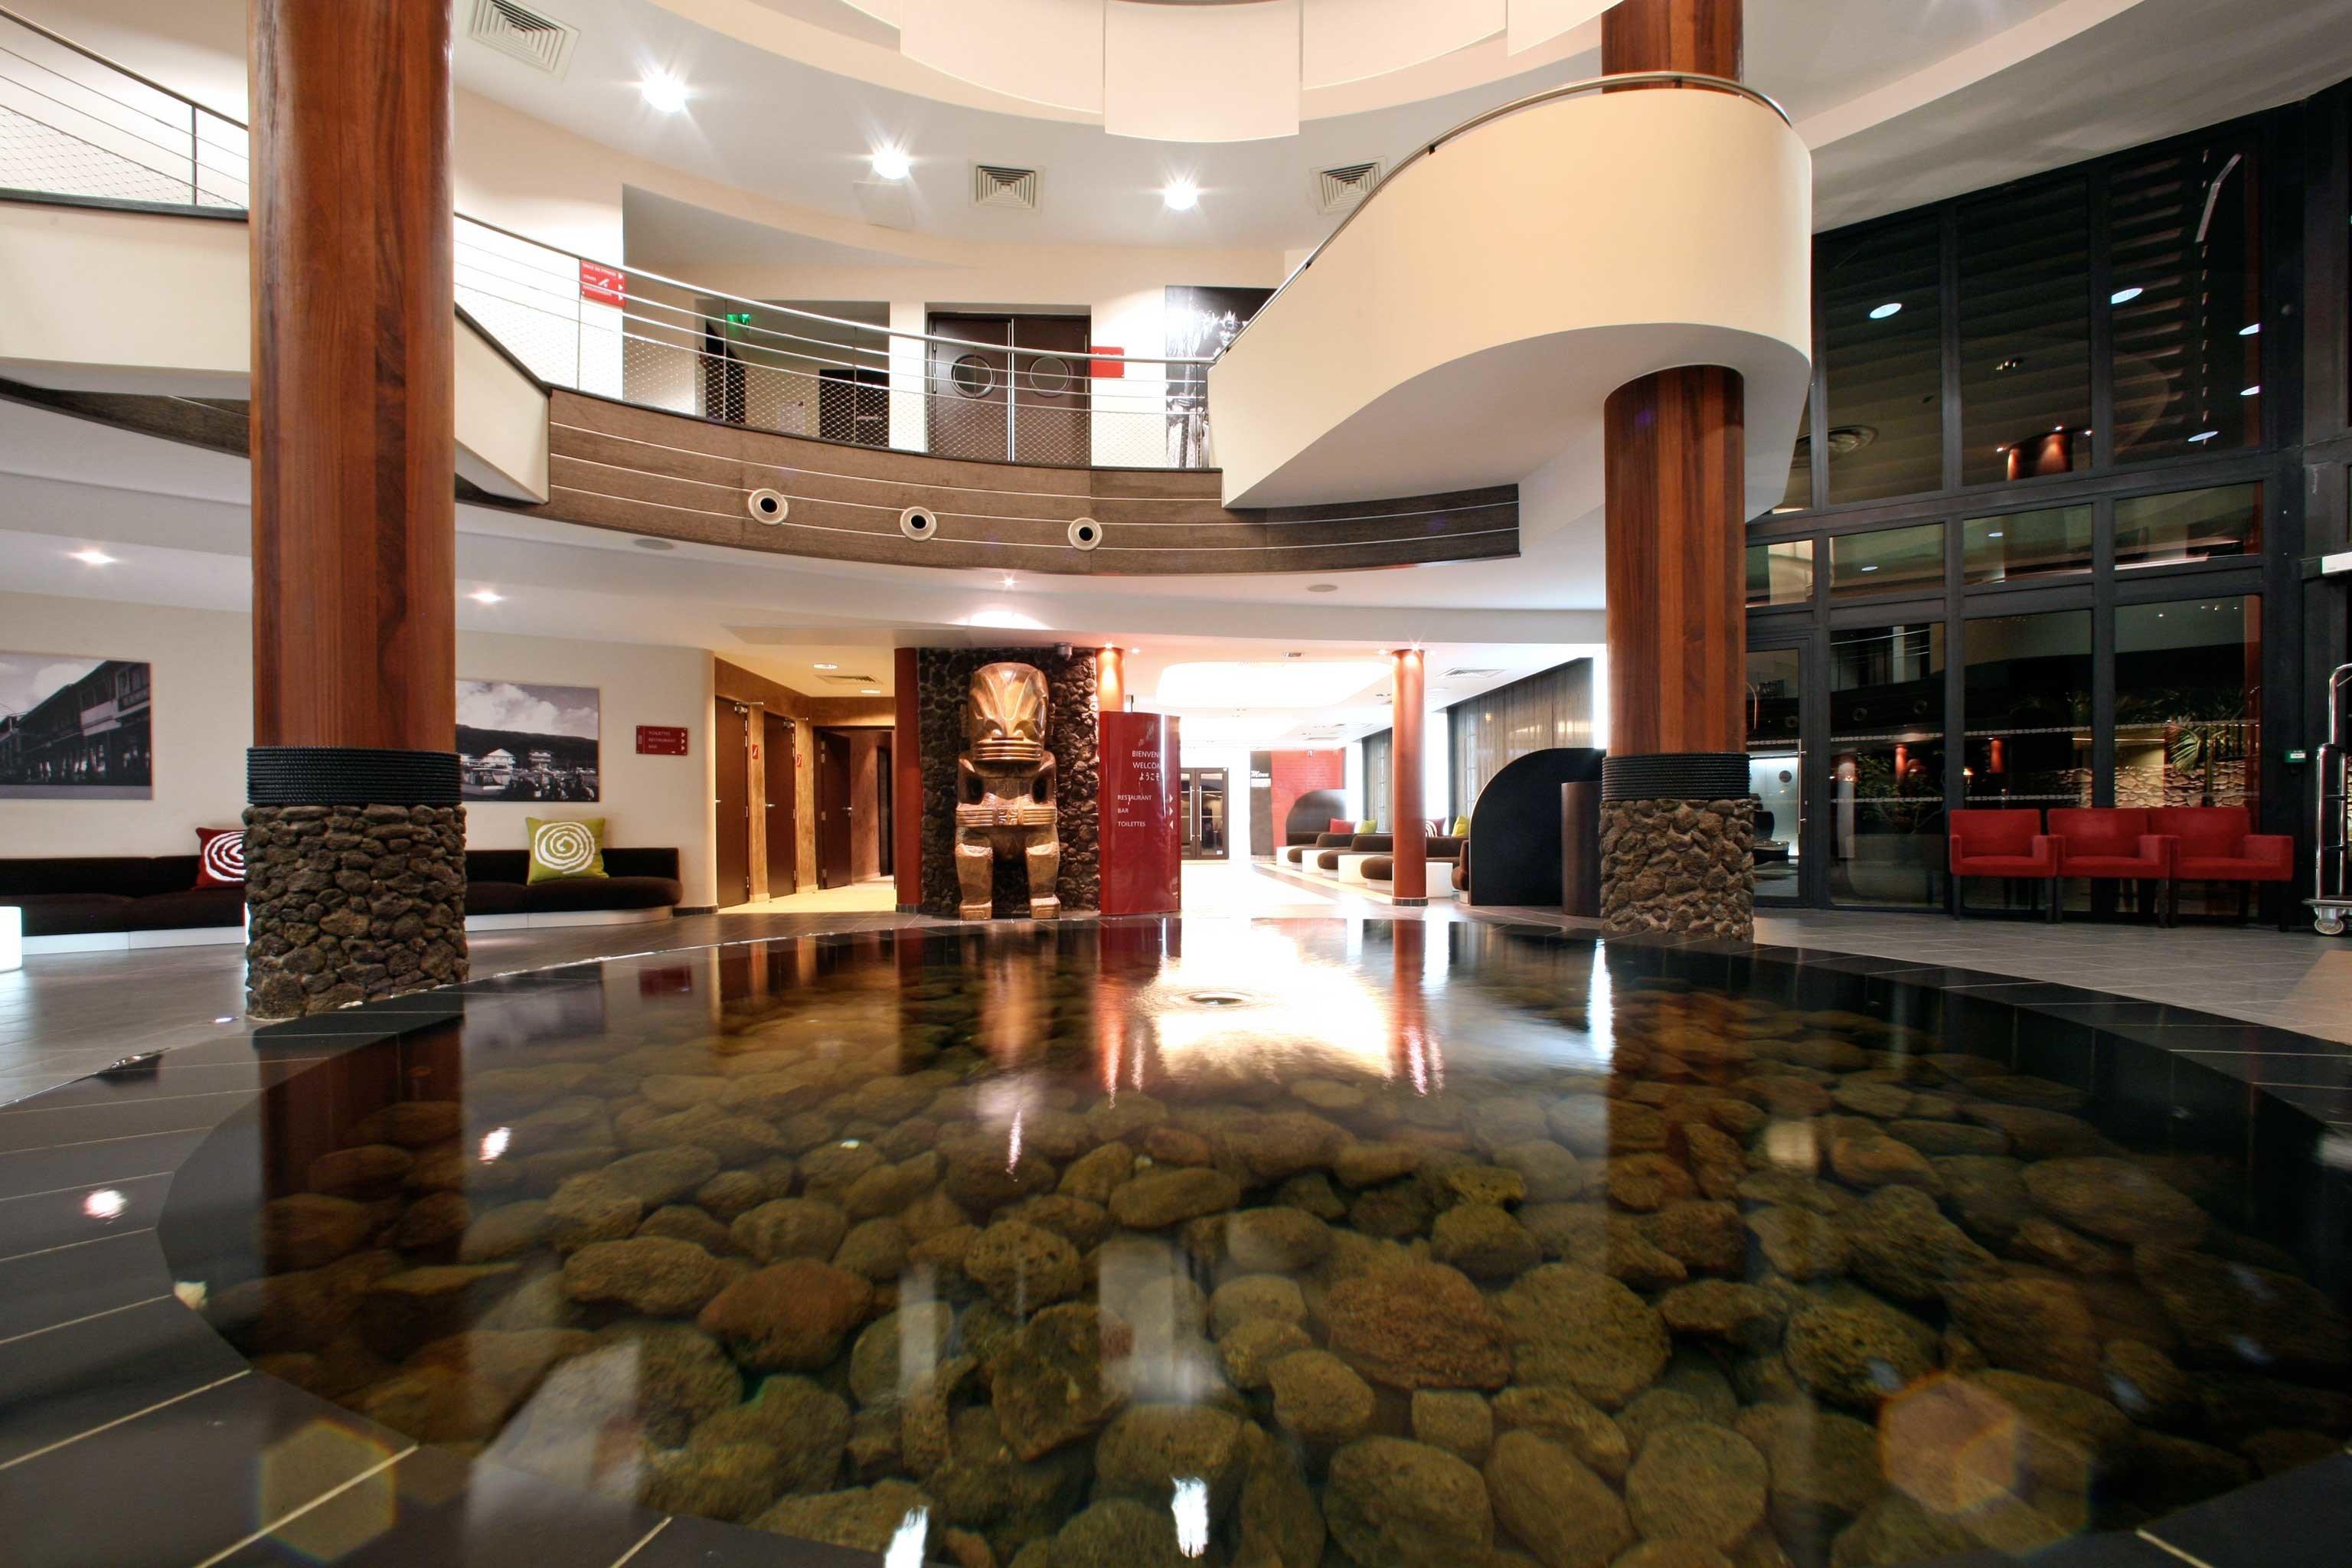 Cultural Eco Lobby Modern building shopping mall retail flooring stone